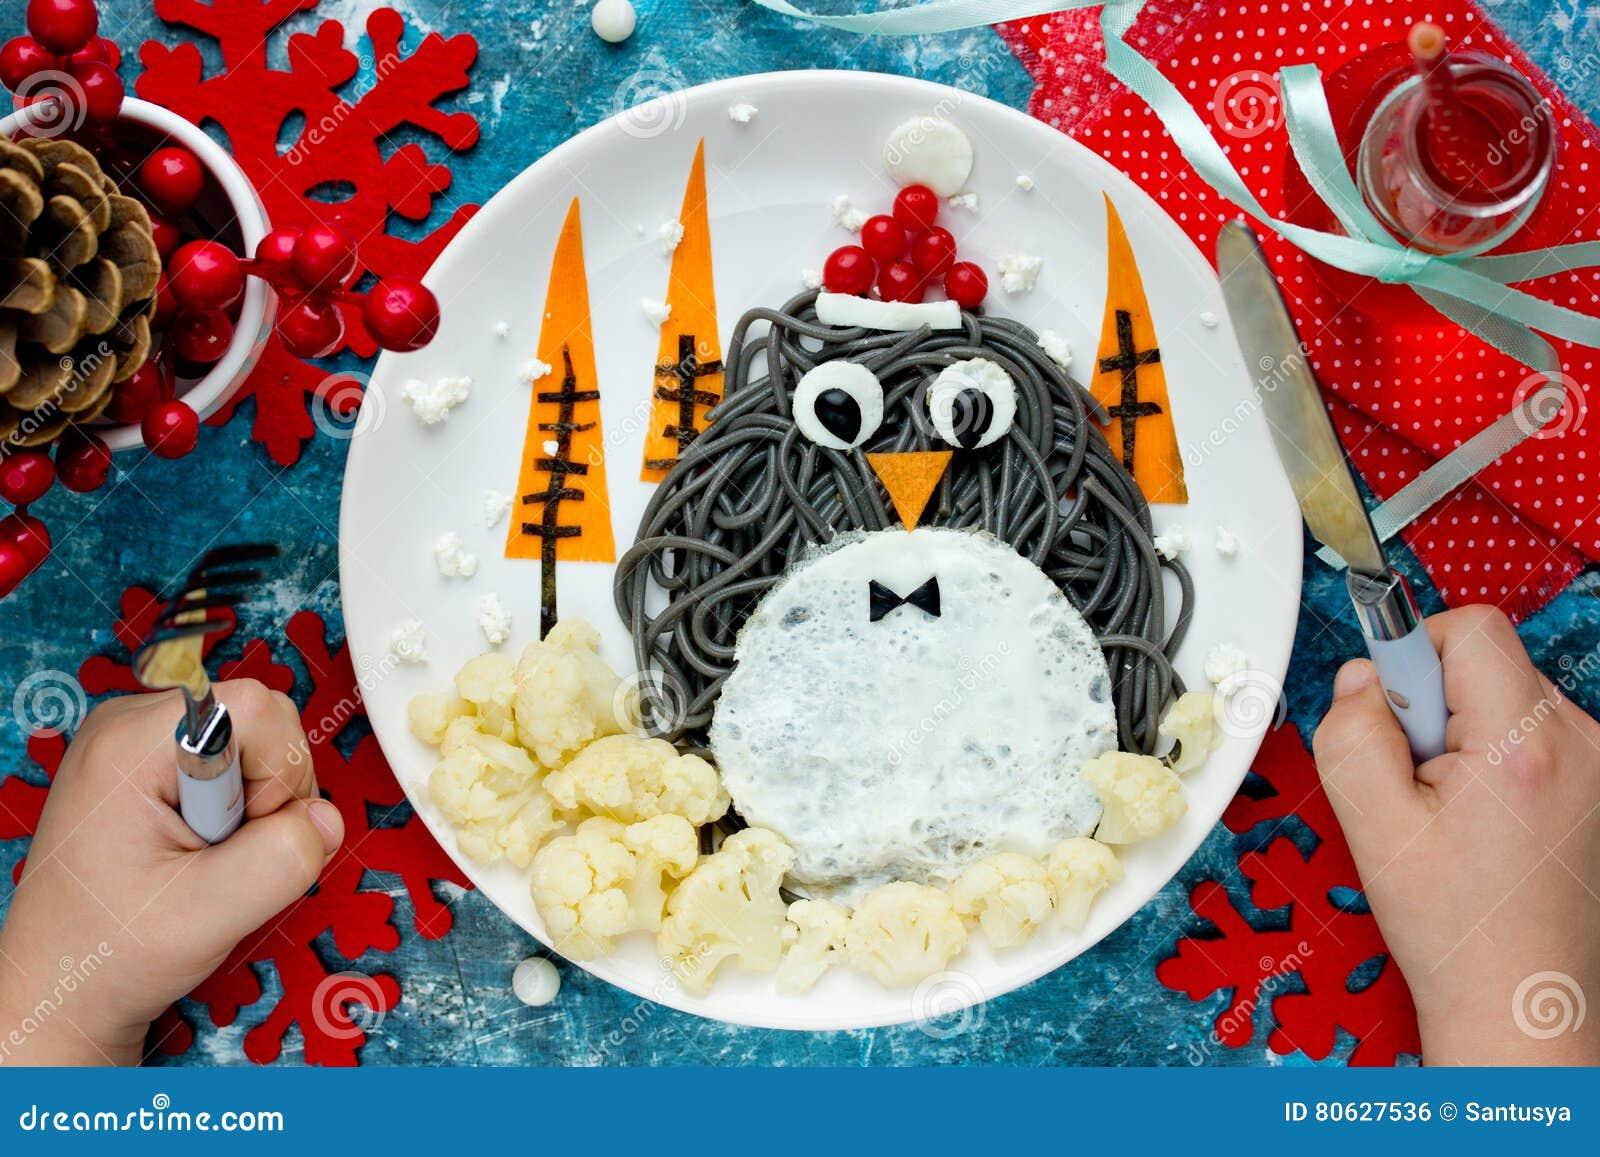 Christmas Fun Food Art Idea For Kids Penguin Black